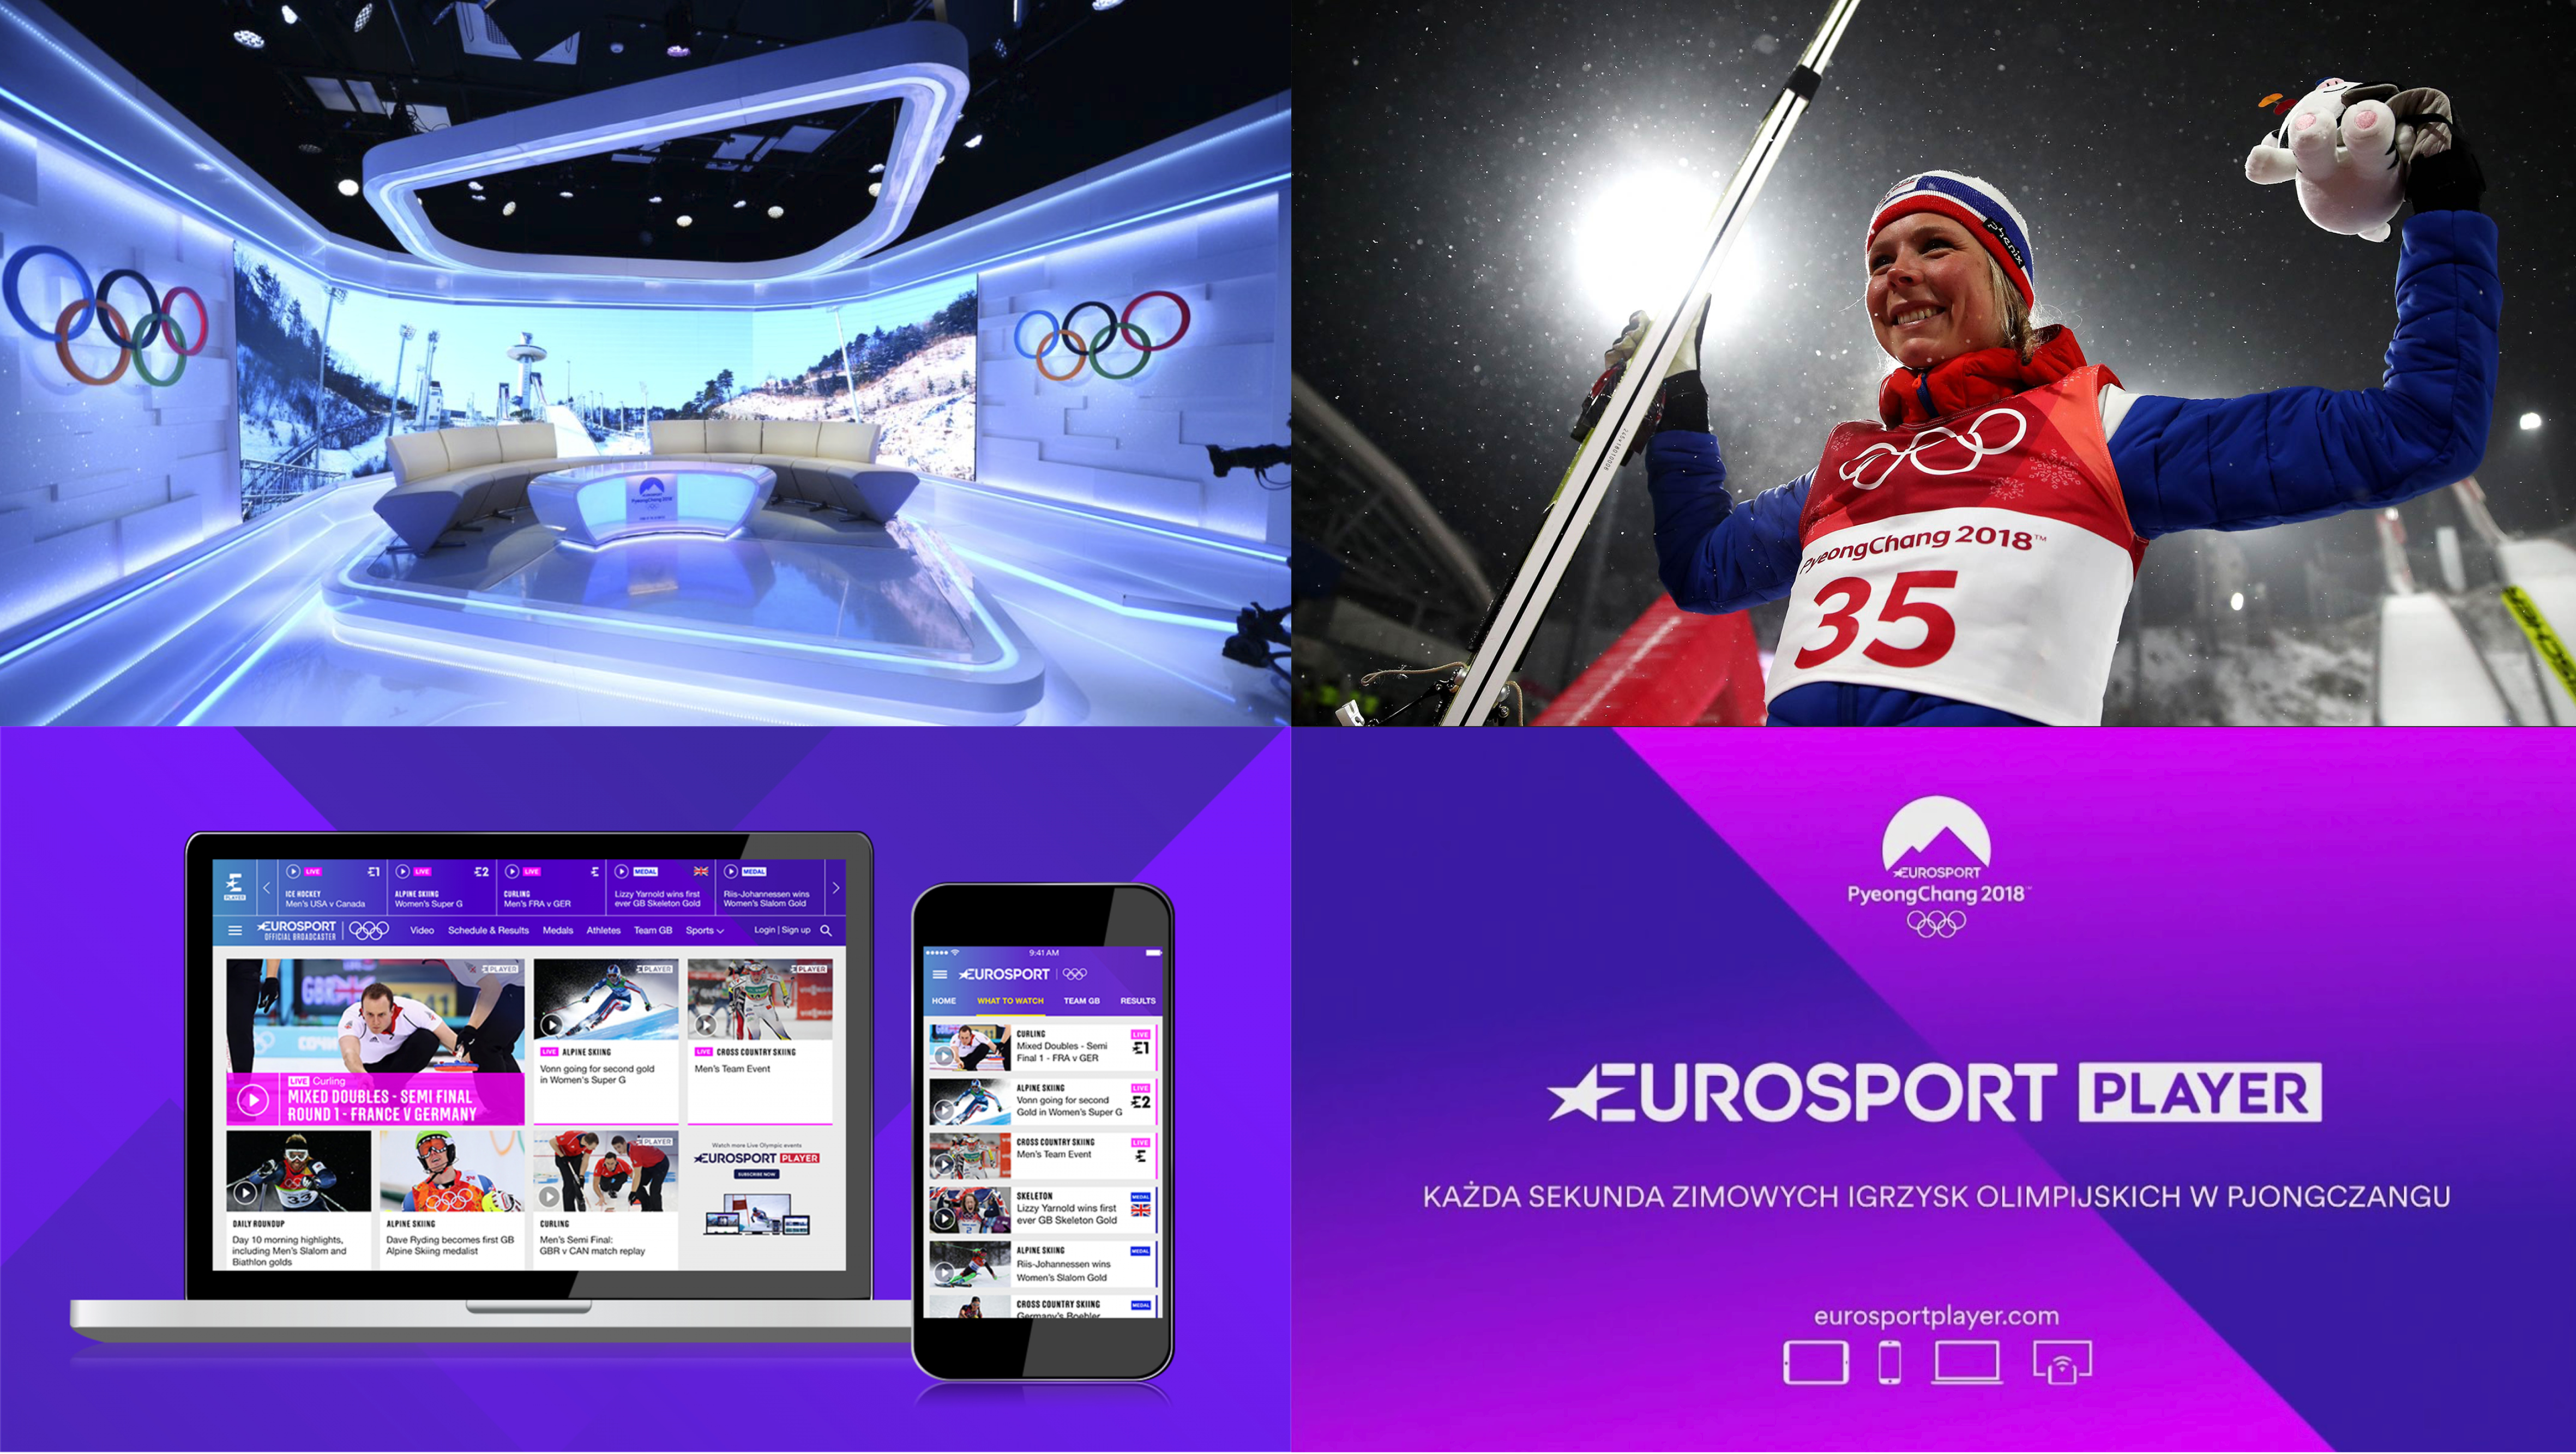 Thumbnail for PyeongChang 2018